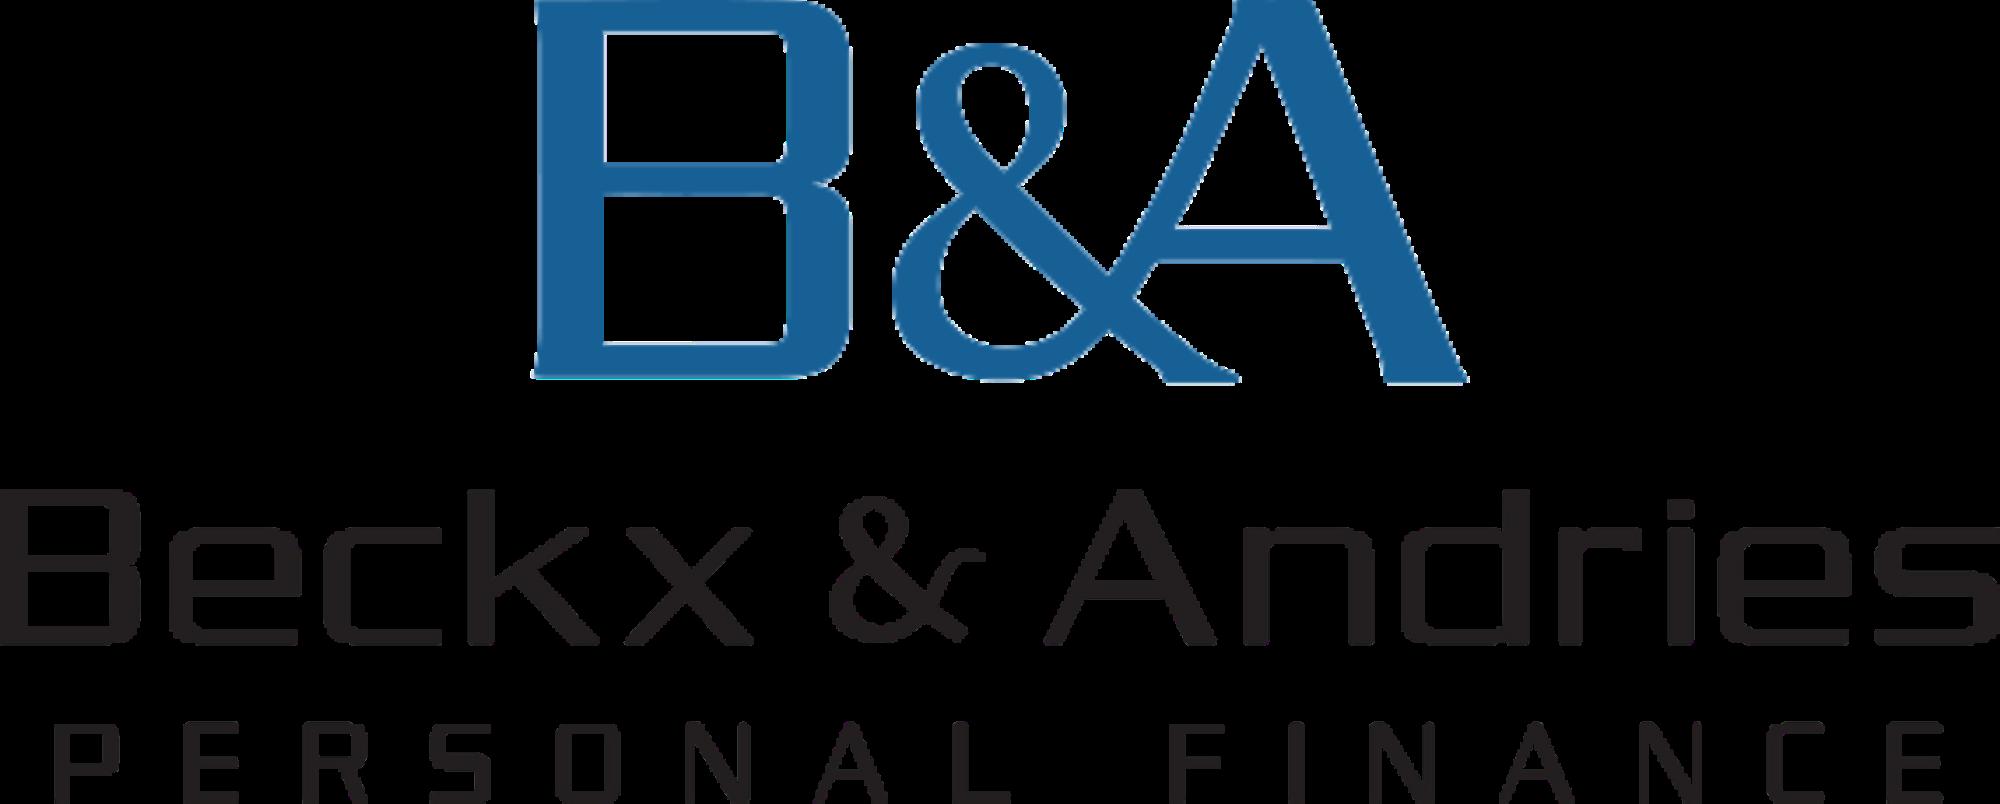 B & A - Beckx & Andries - B&A